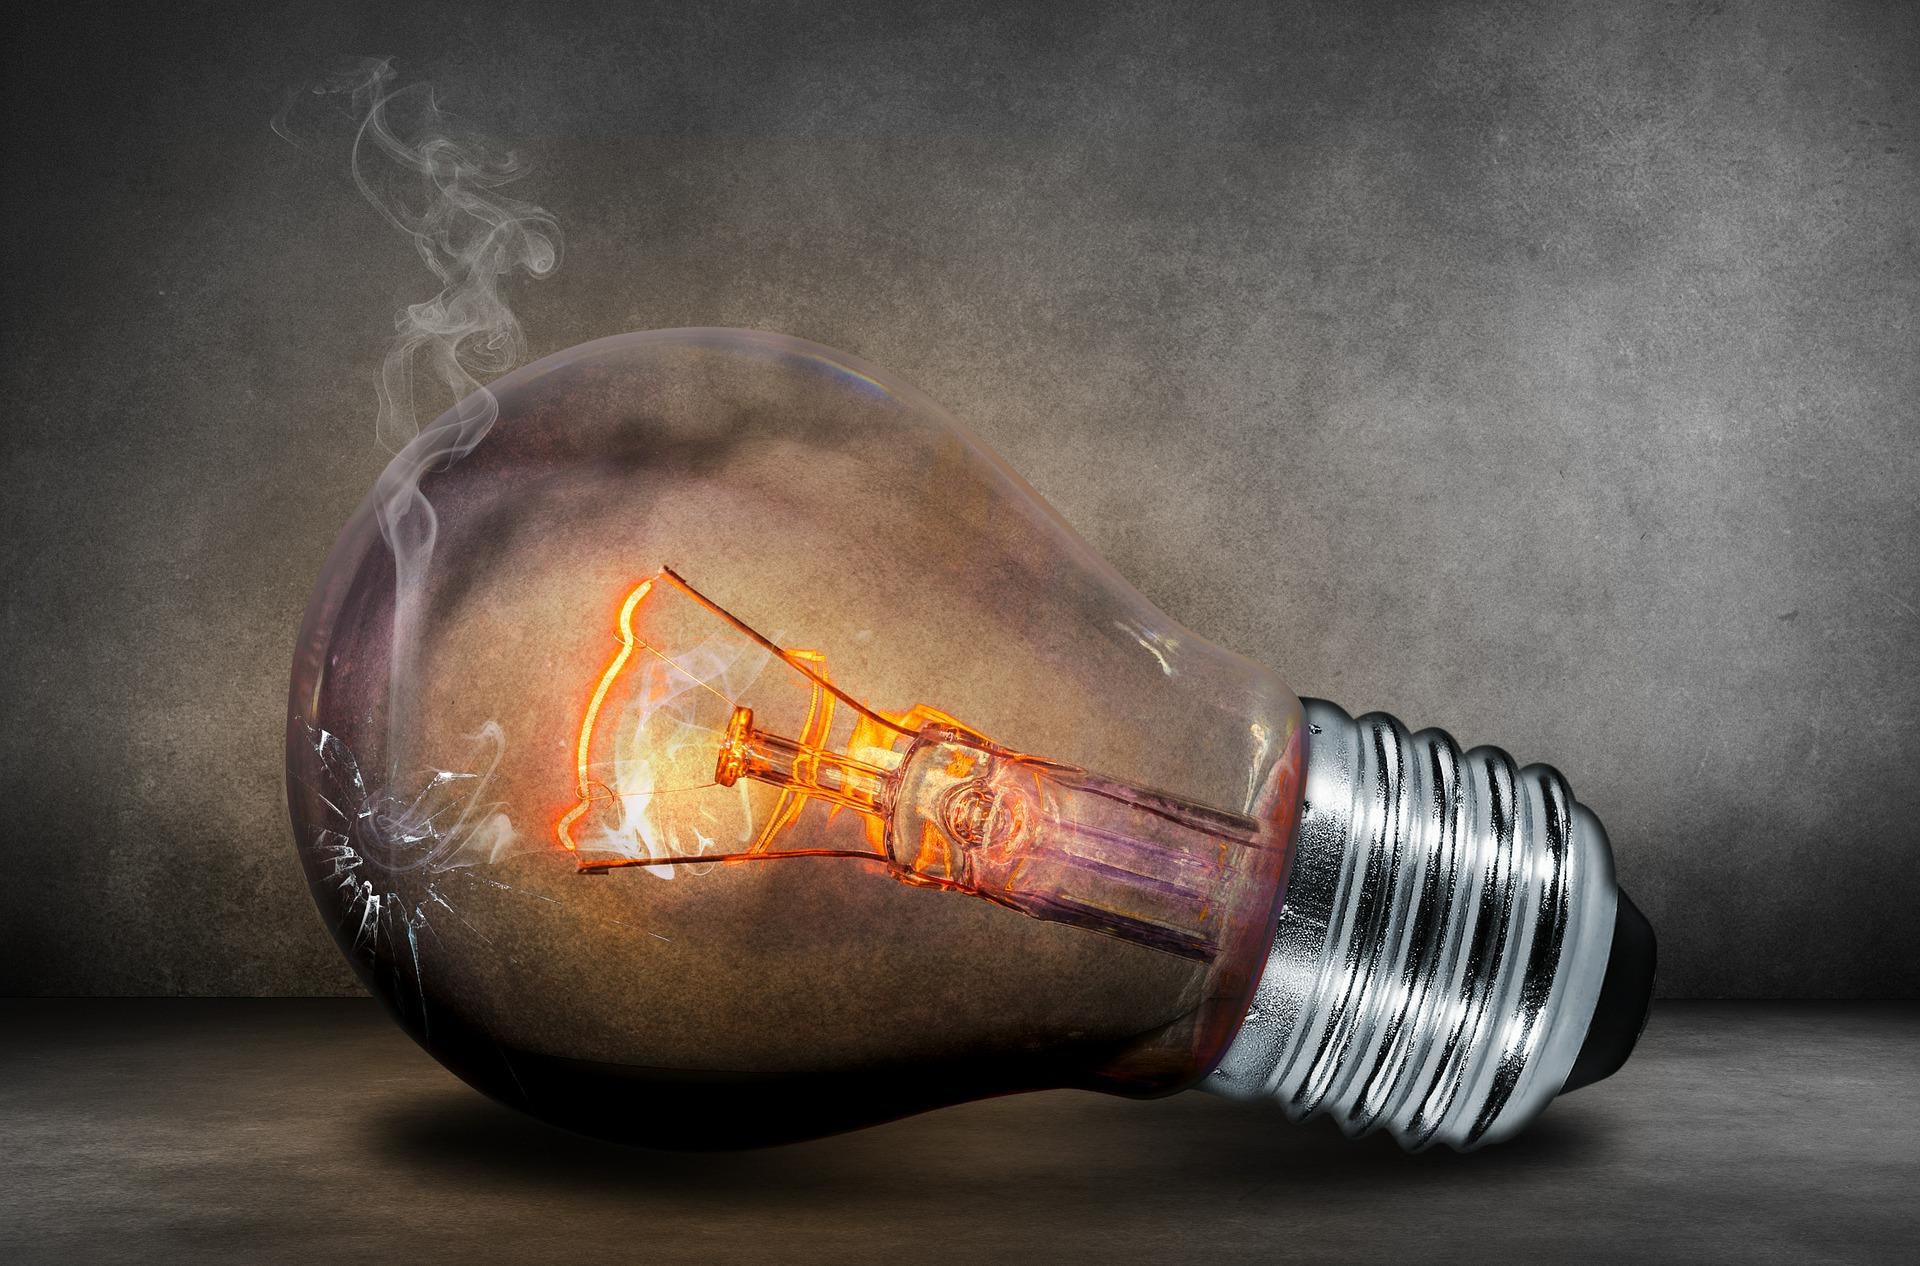 Bz elektrodrošības grupa